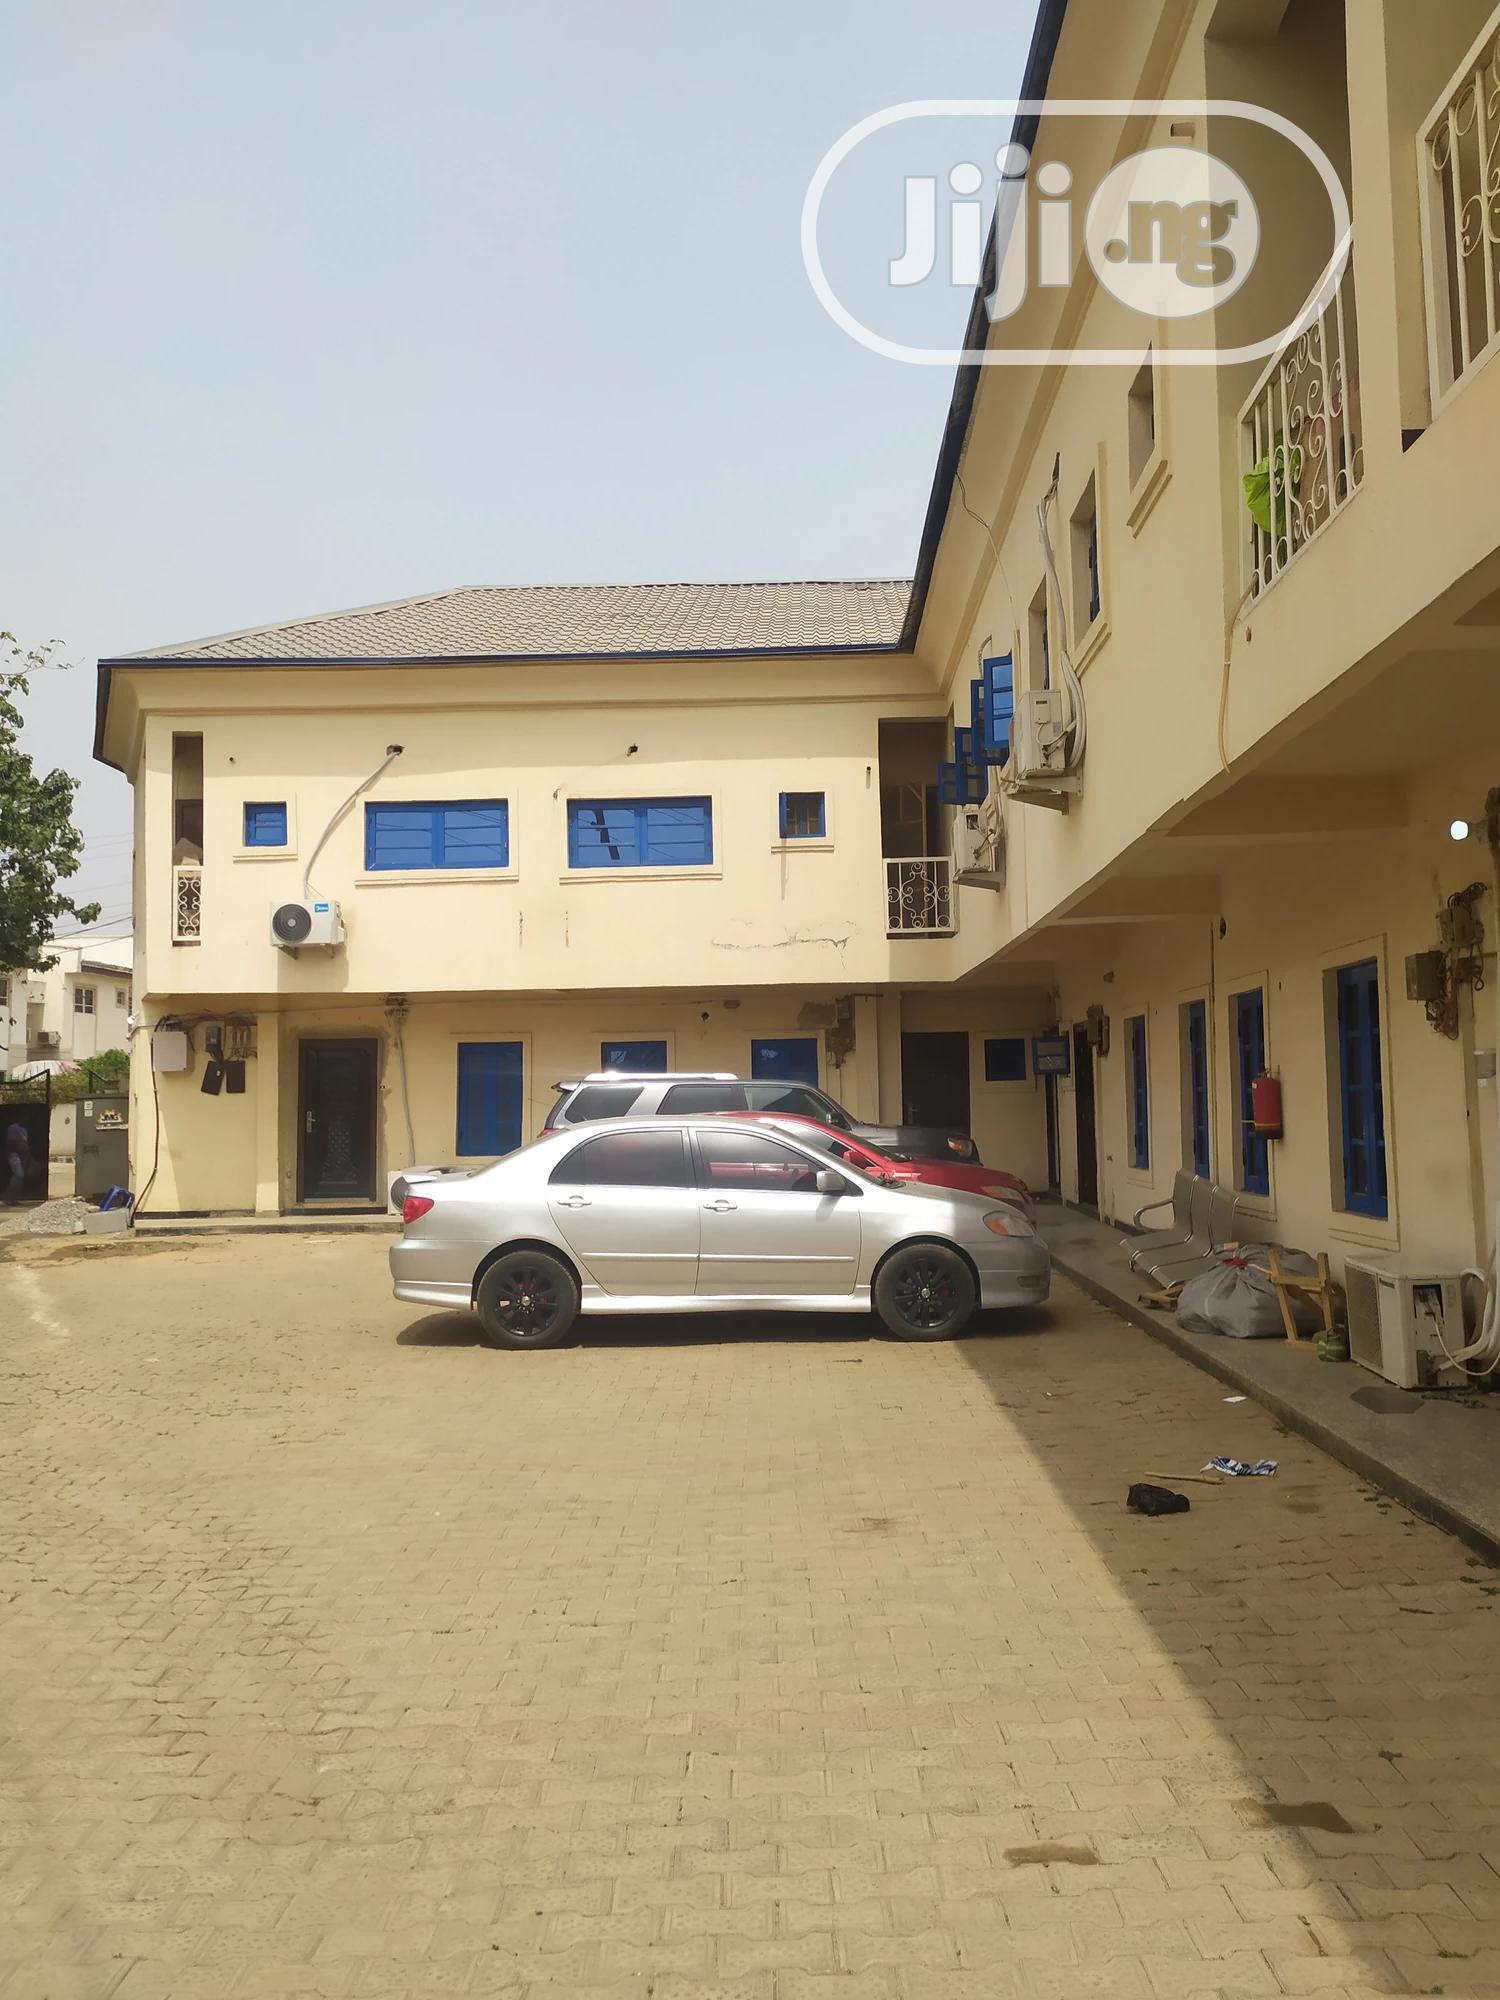 5 Units of 3 Bedroom Terrace Duplexes With BQ